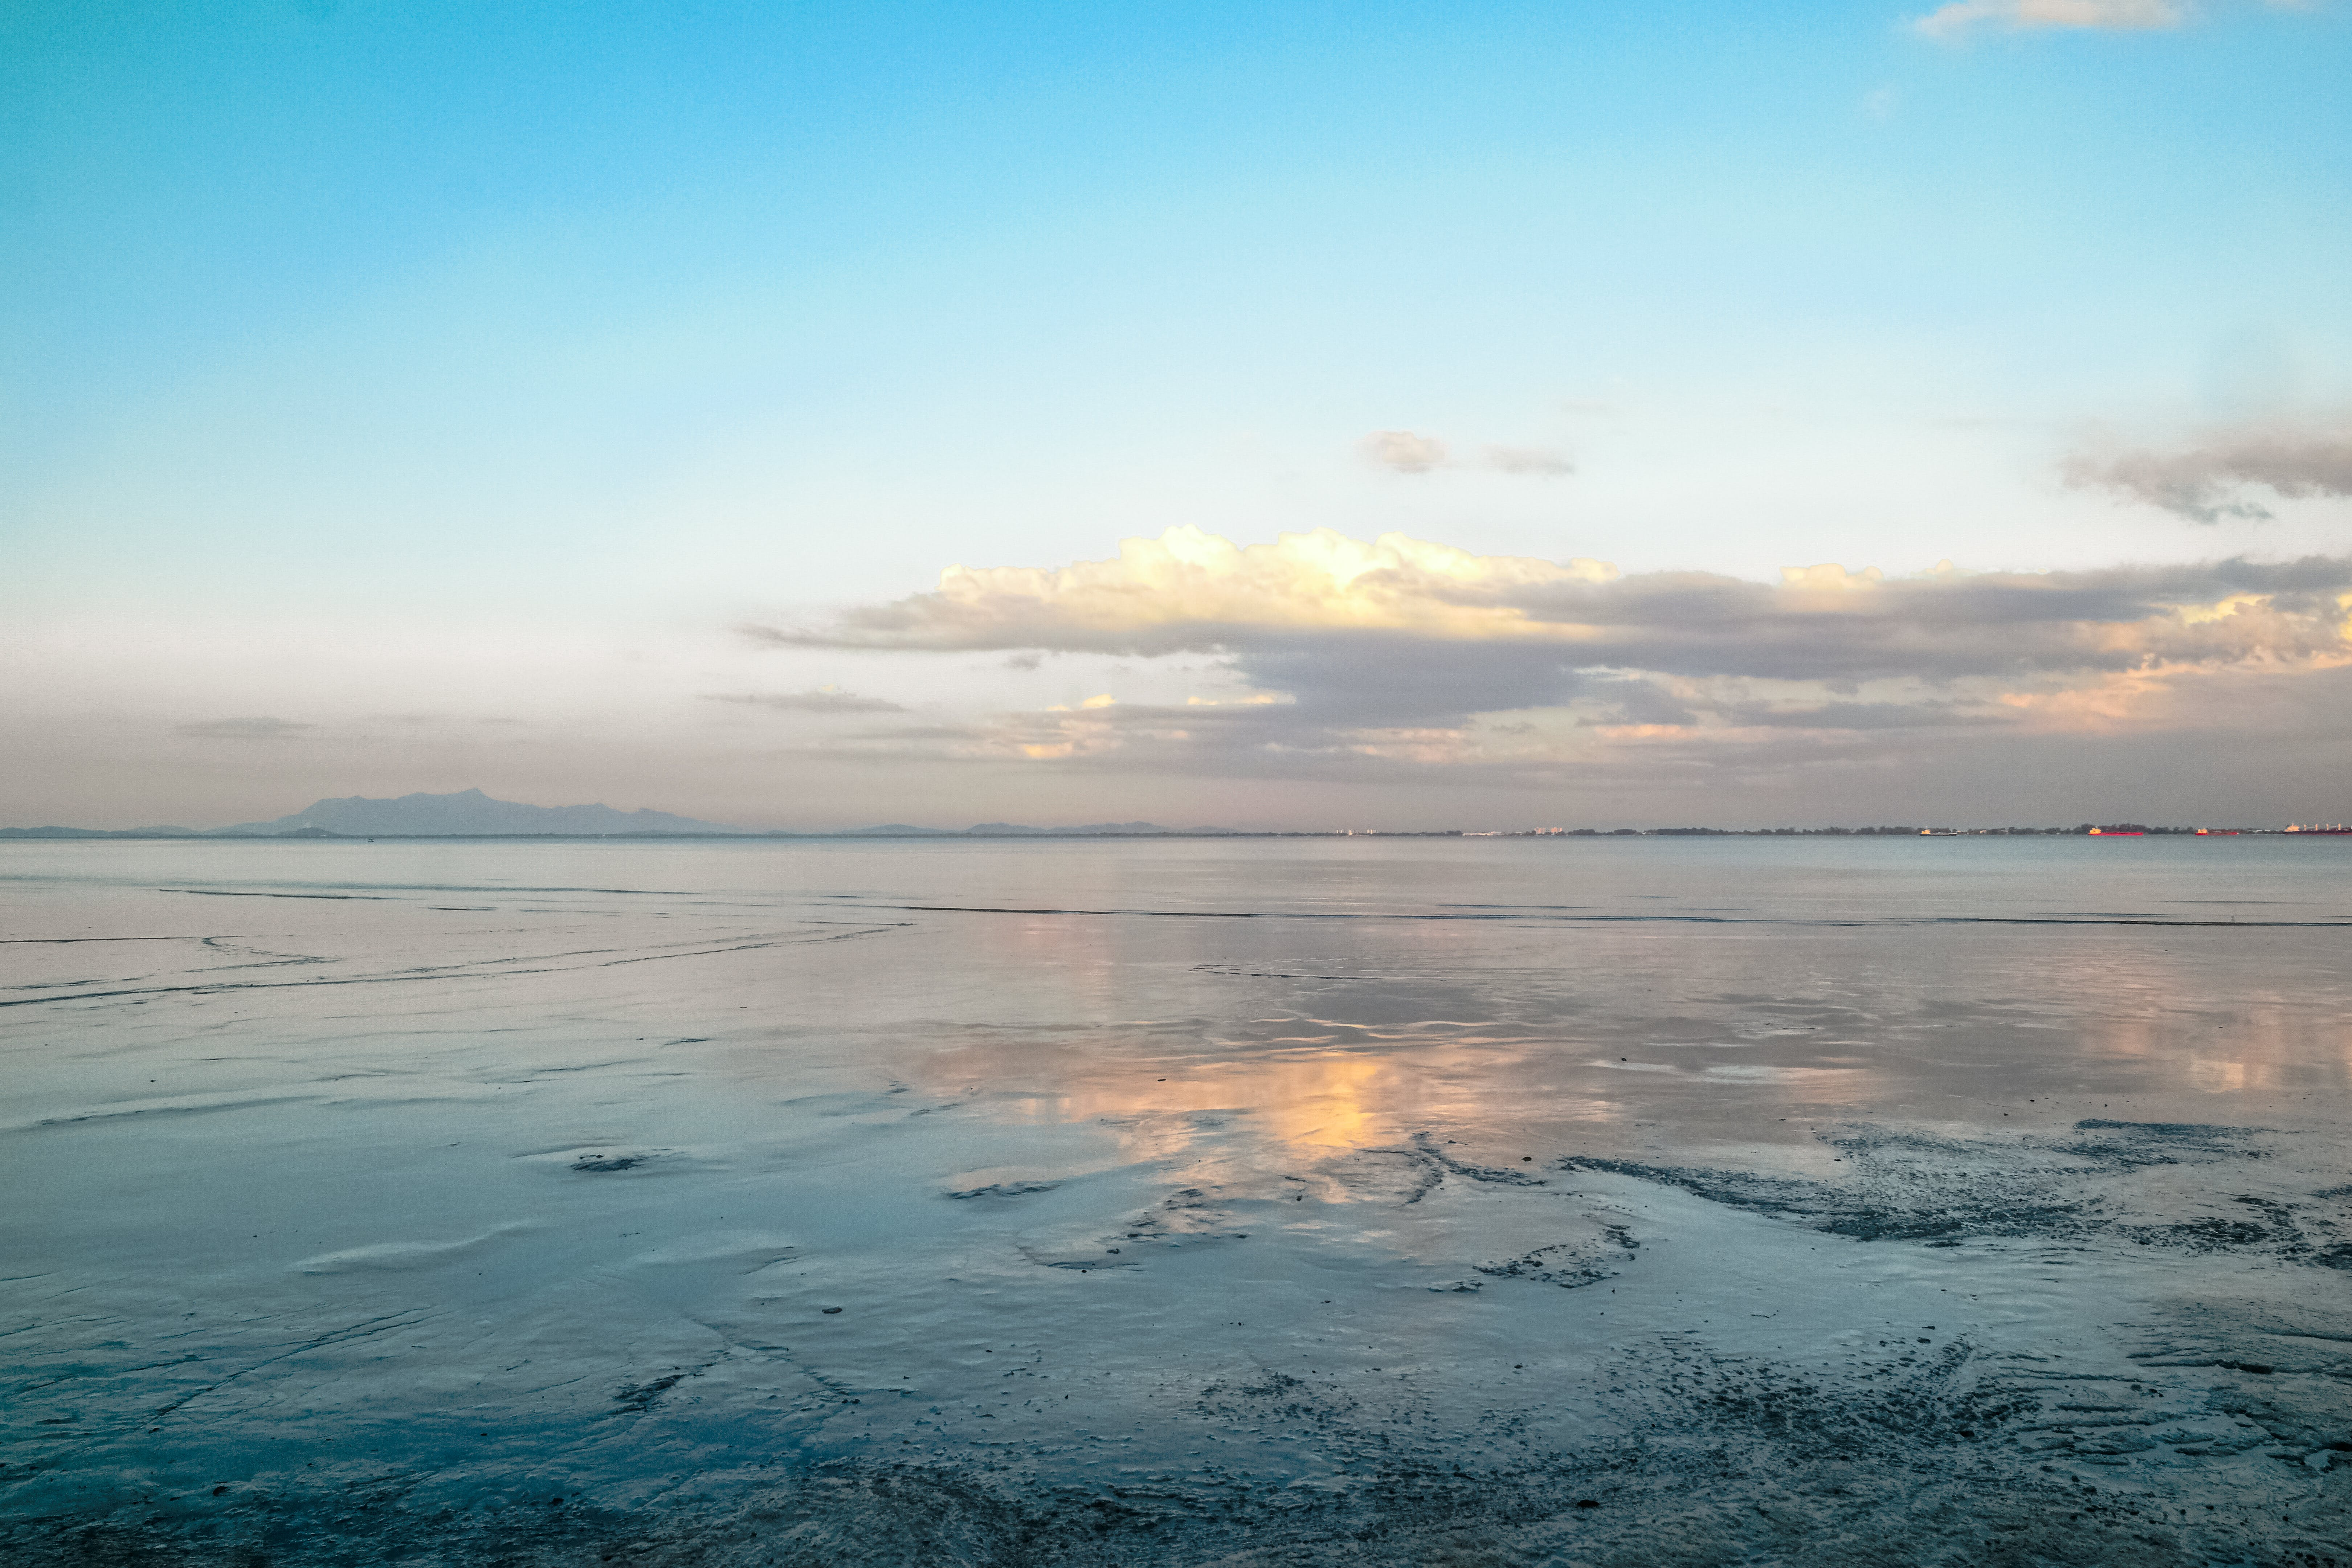 Gratis stockfoto met blikveld, h2o, hemel, natuur